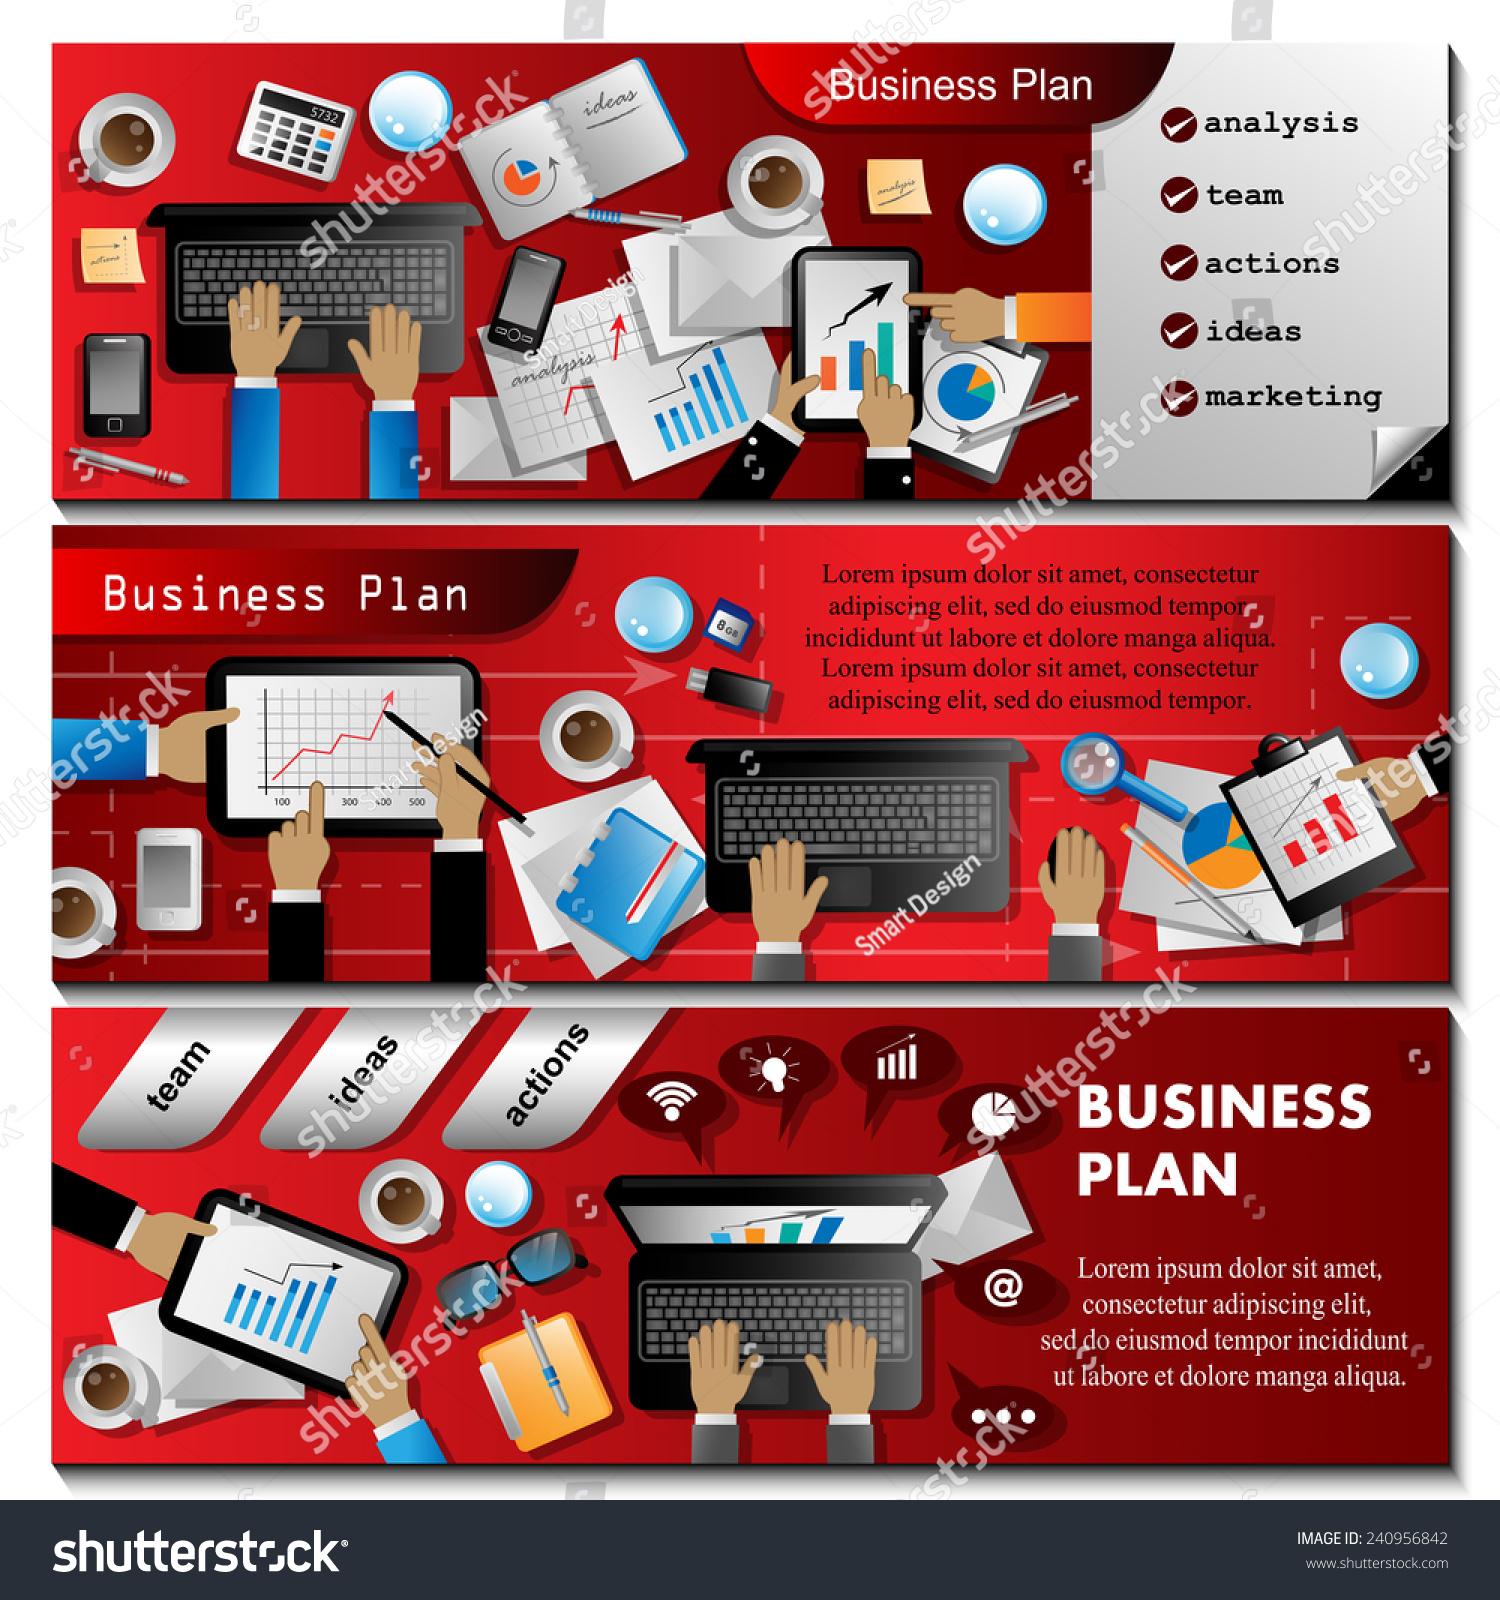 Business Plan Flyer Template Vector Illustration Stock Vector 240956842 Shutterstock